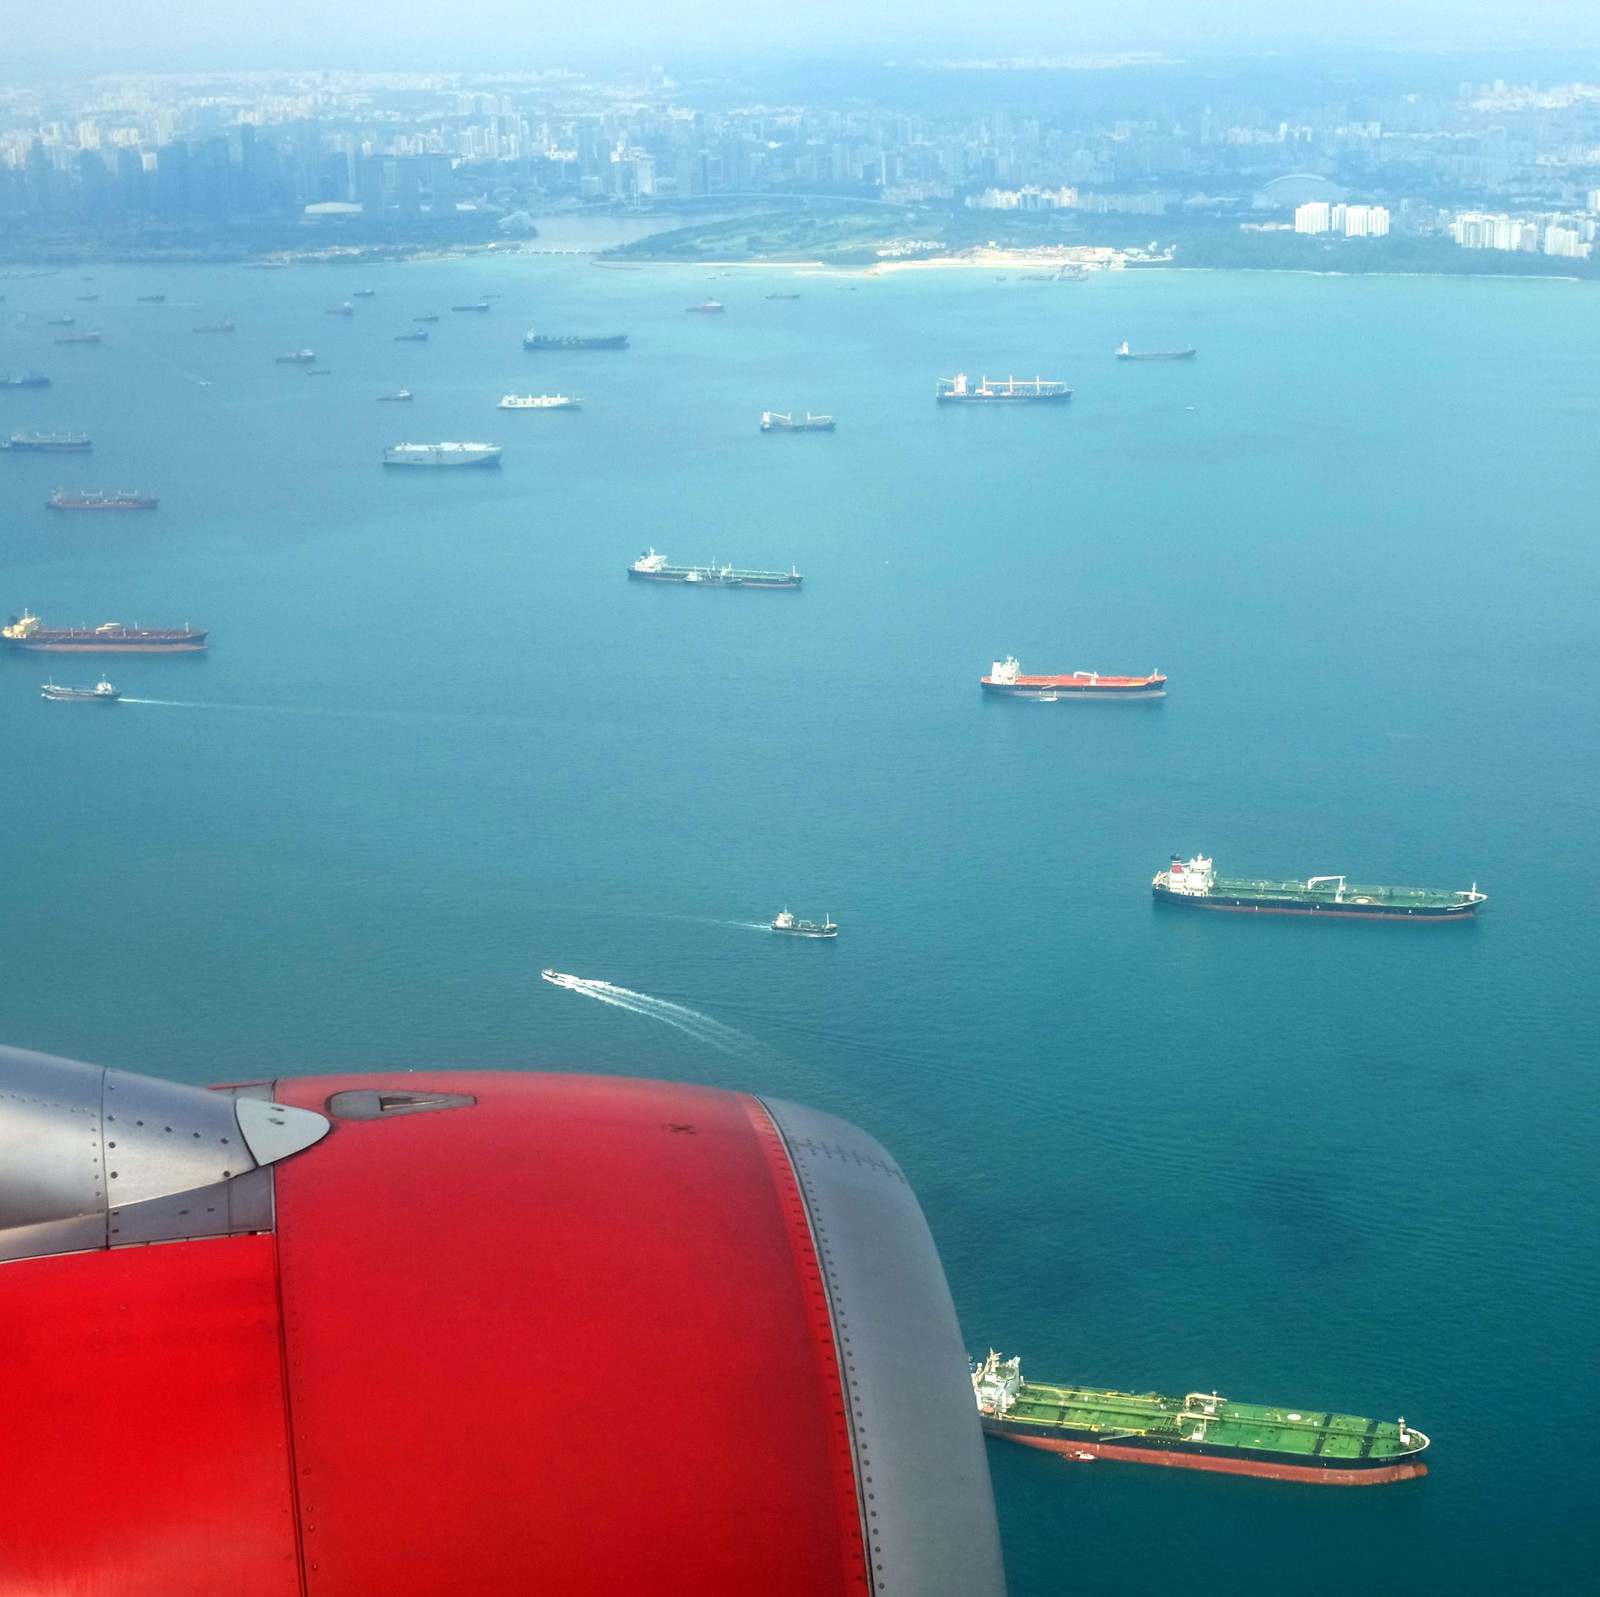 Singapurlaub